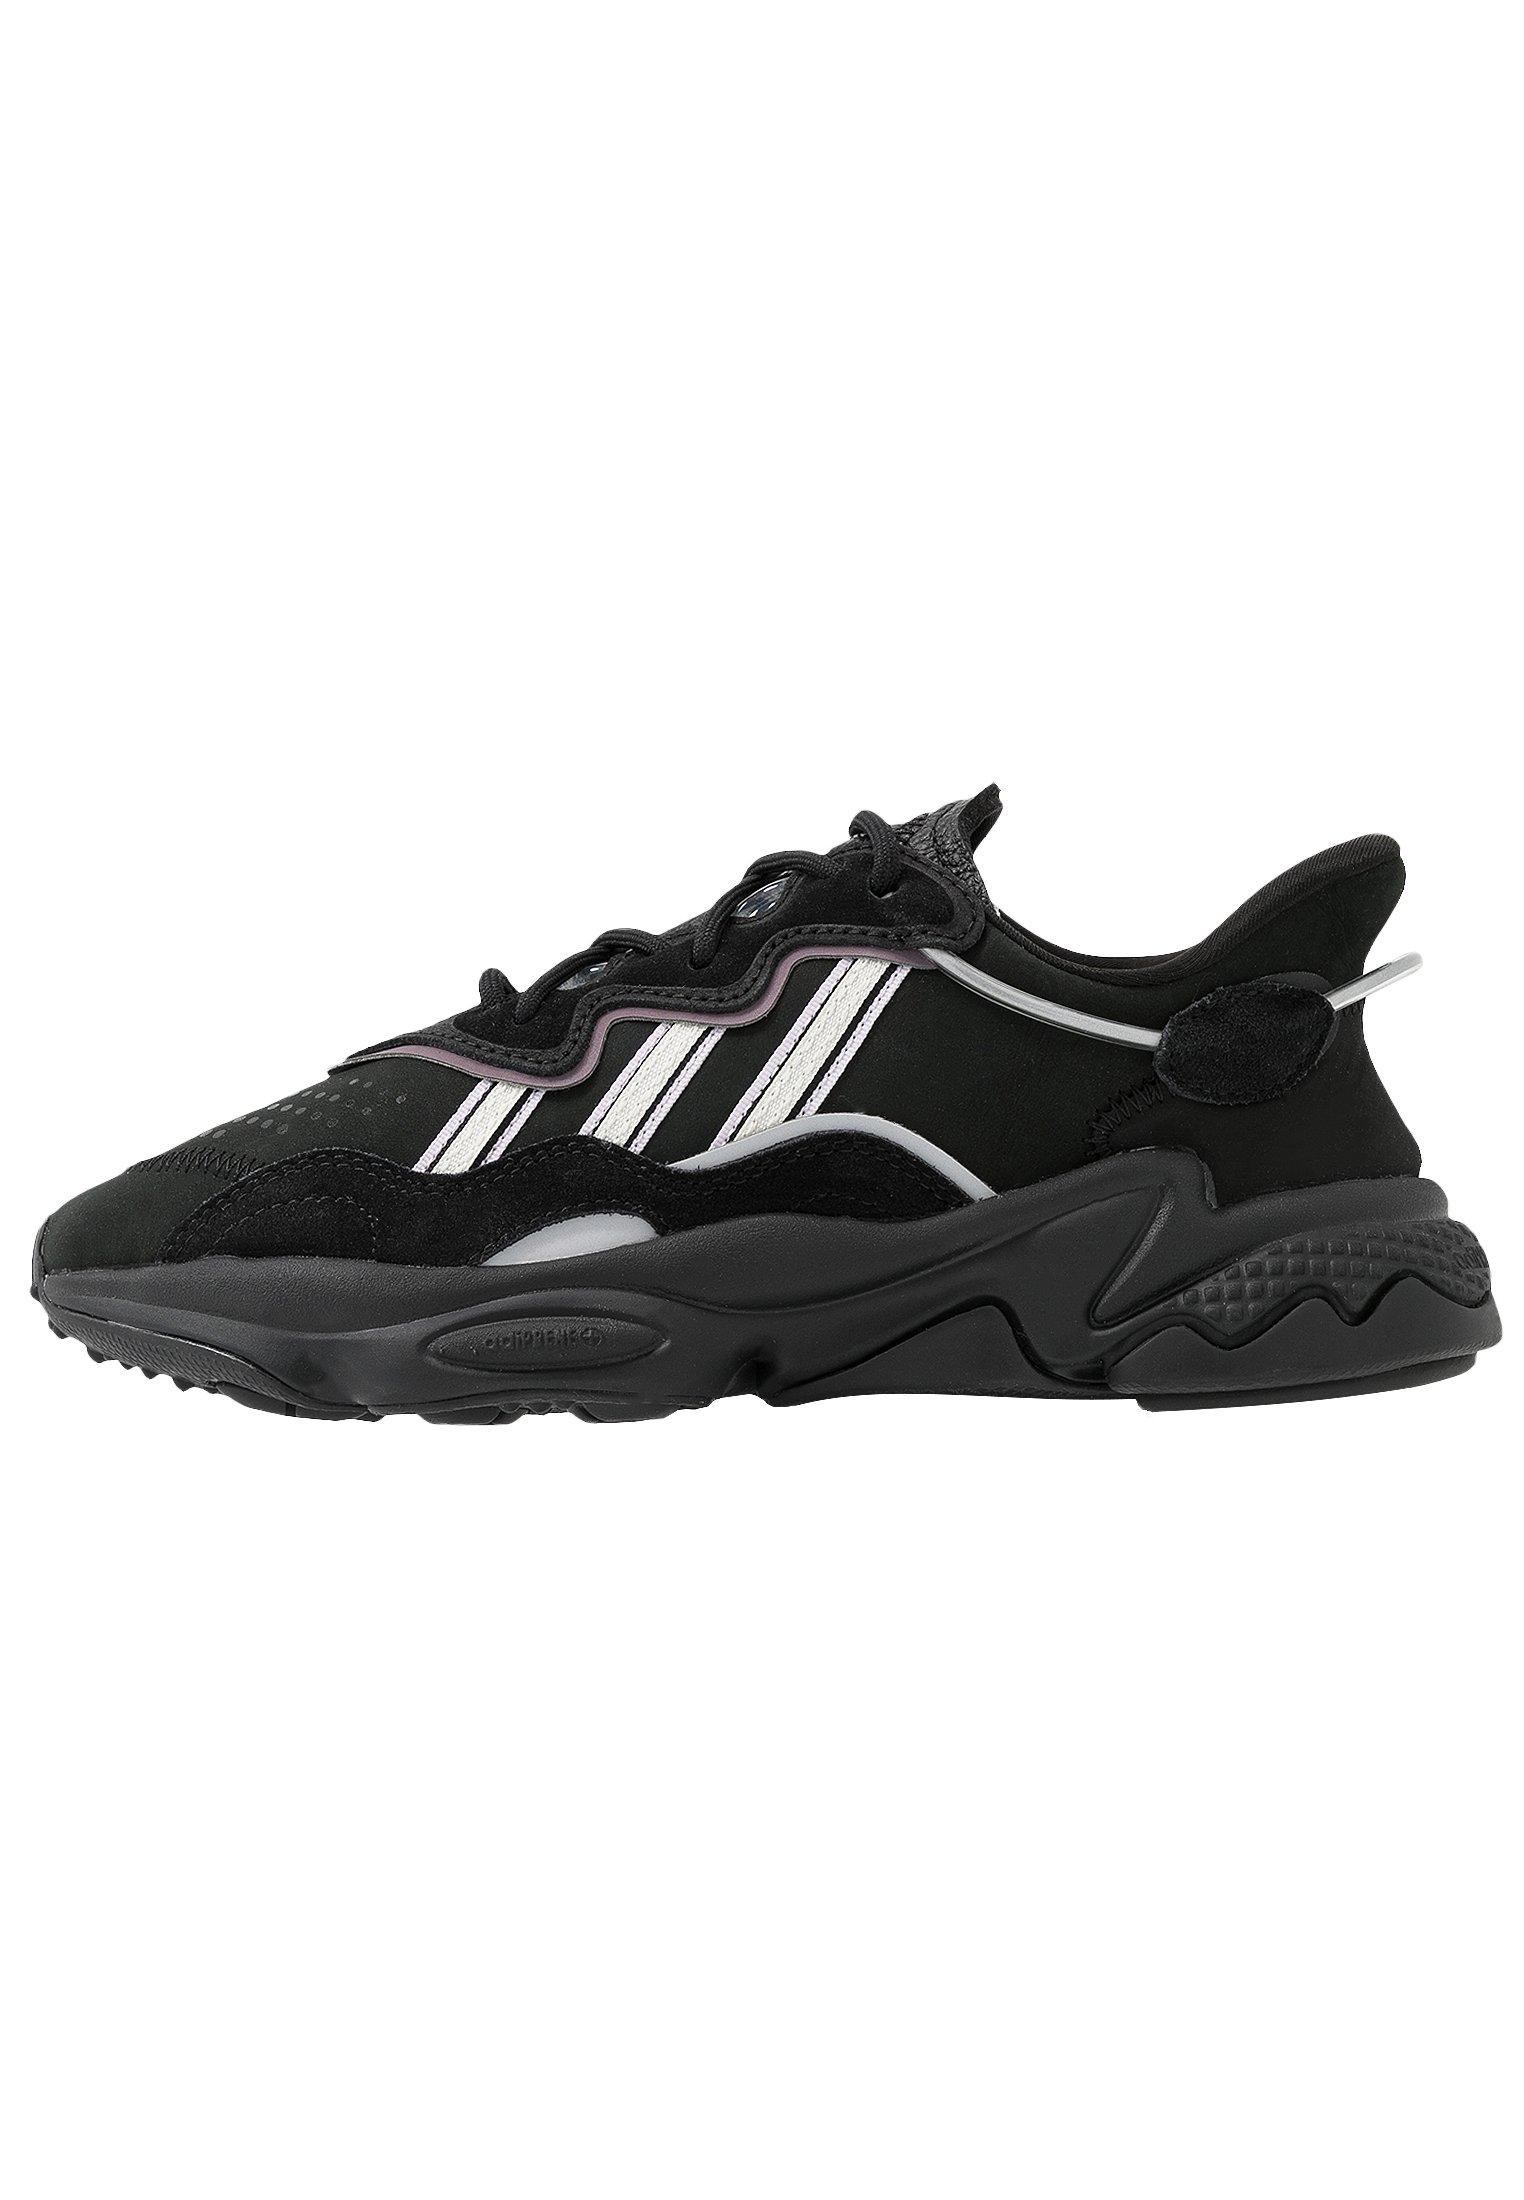 OZWEEGO Sneakers laag core blackoffwhitelegion purple